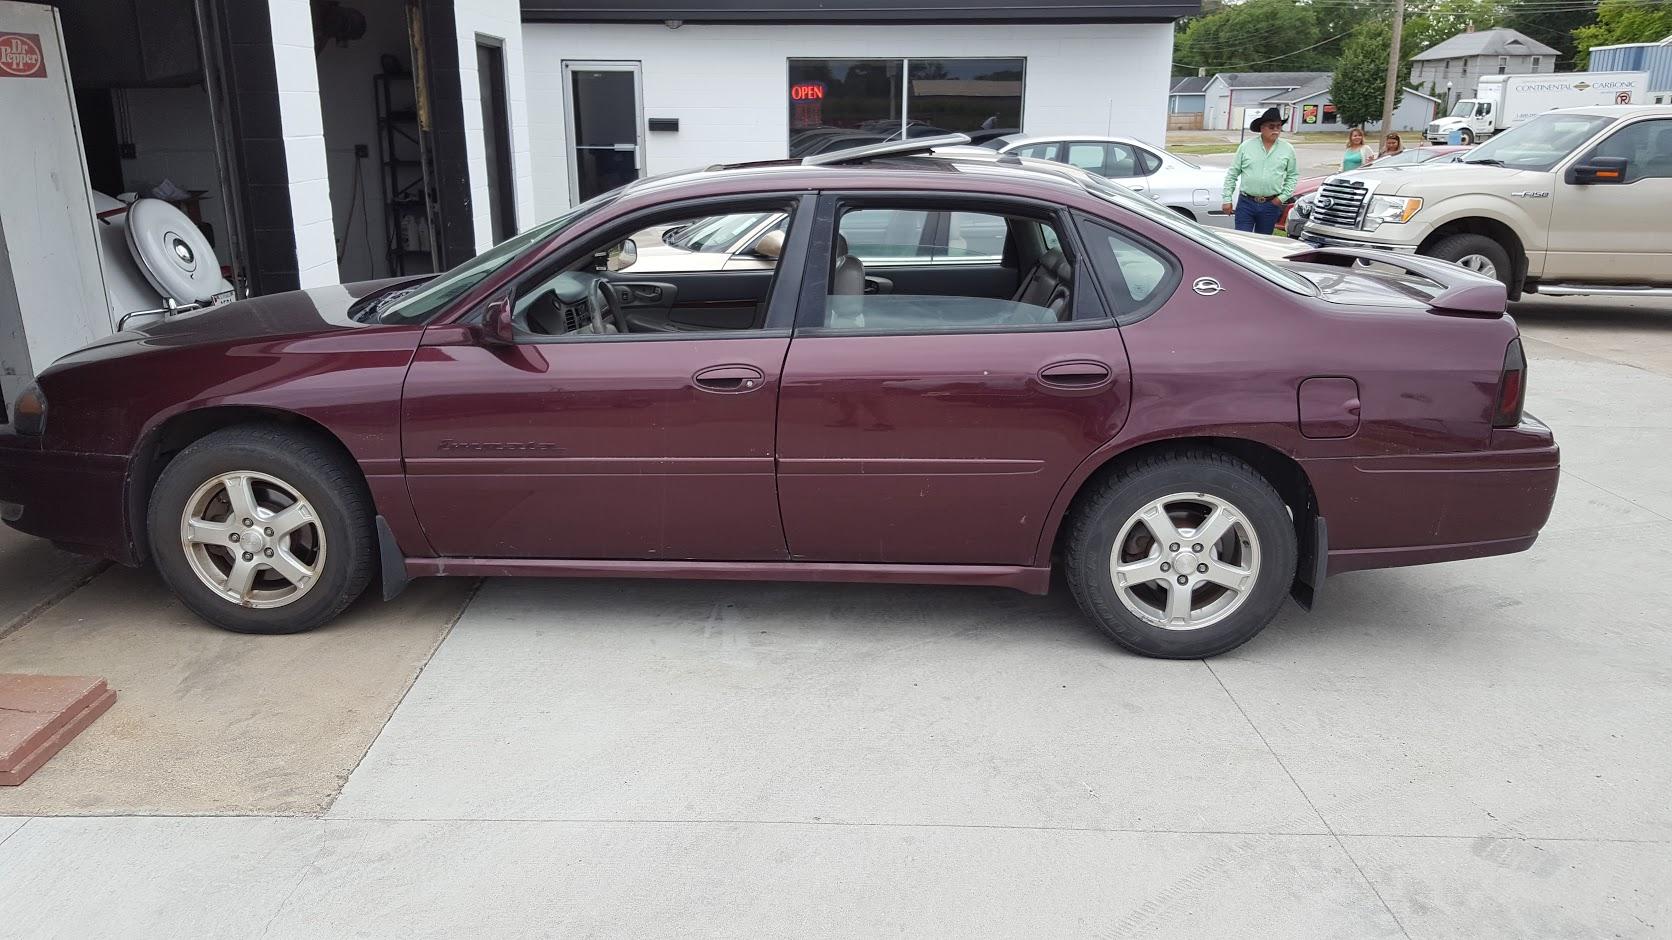 Good News Auto 2003 Chevy Trailblazer Cd Player 2005 Chevrolet Impala Ls